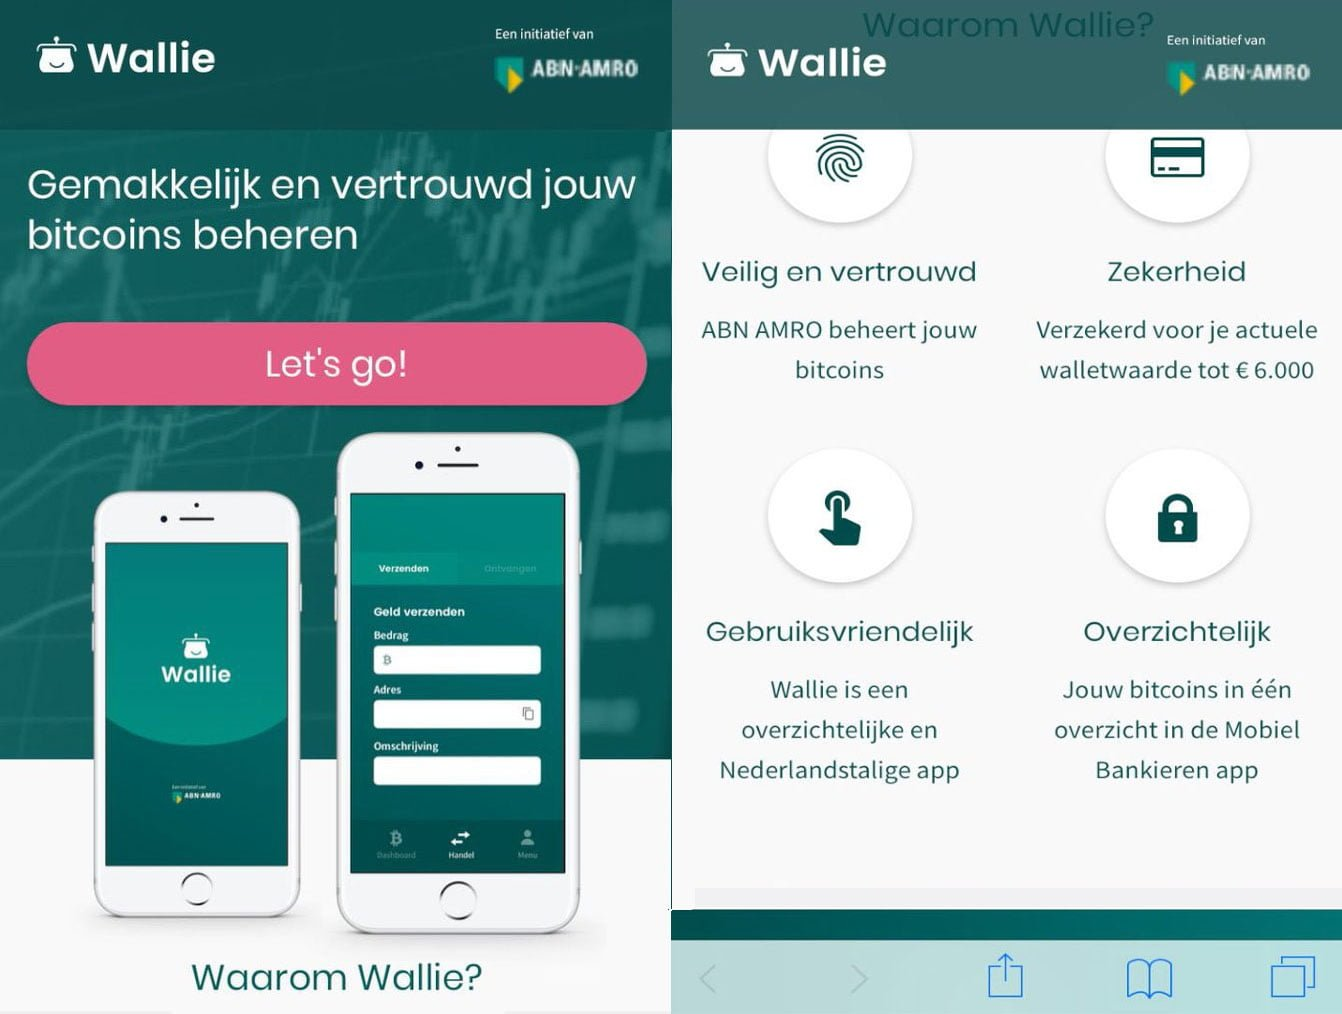 Wallie bitcoin wallet ABN AMRO